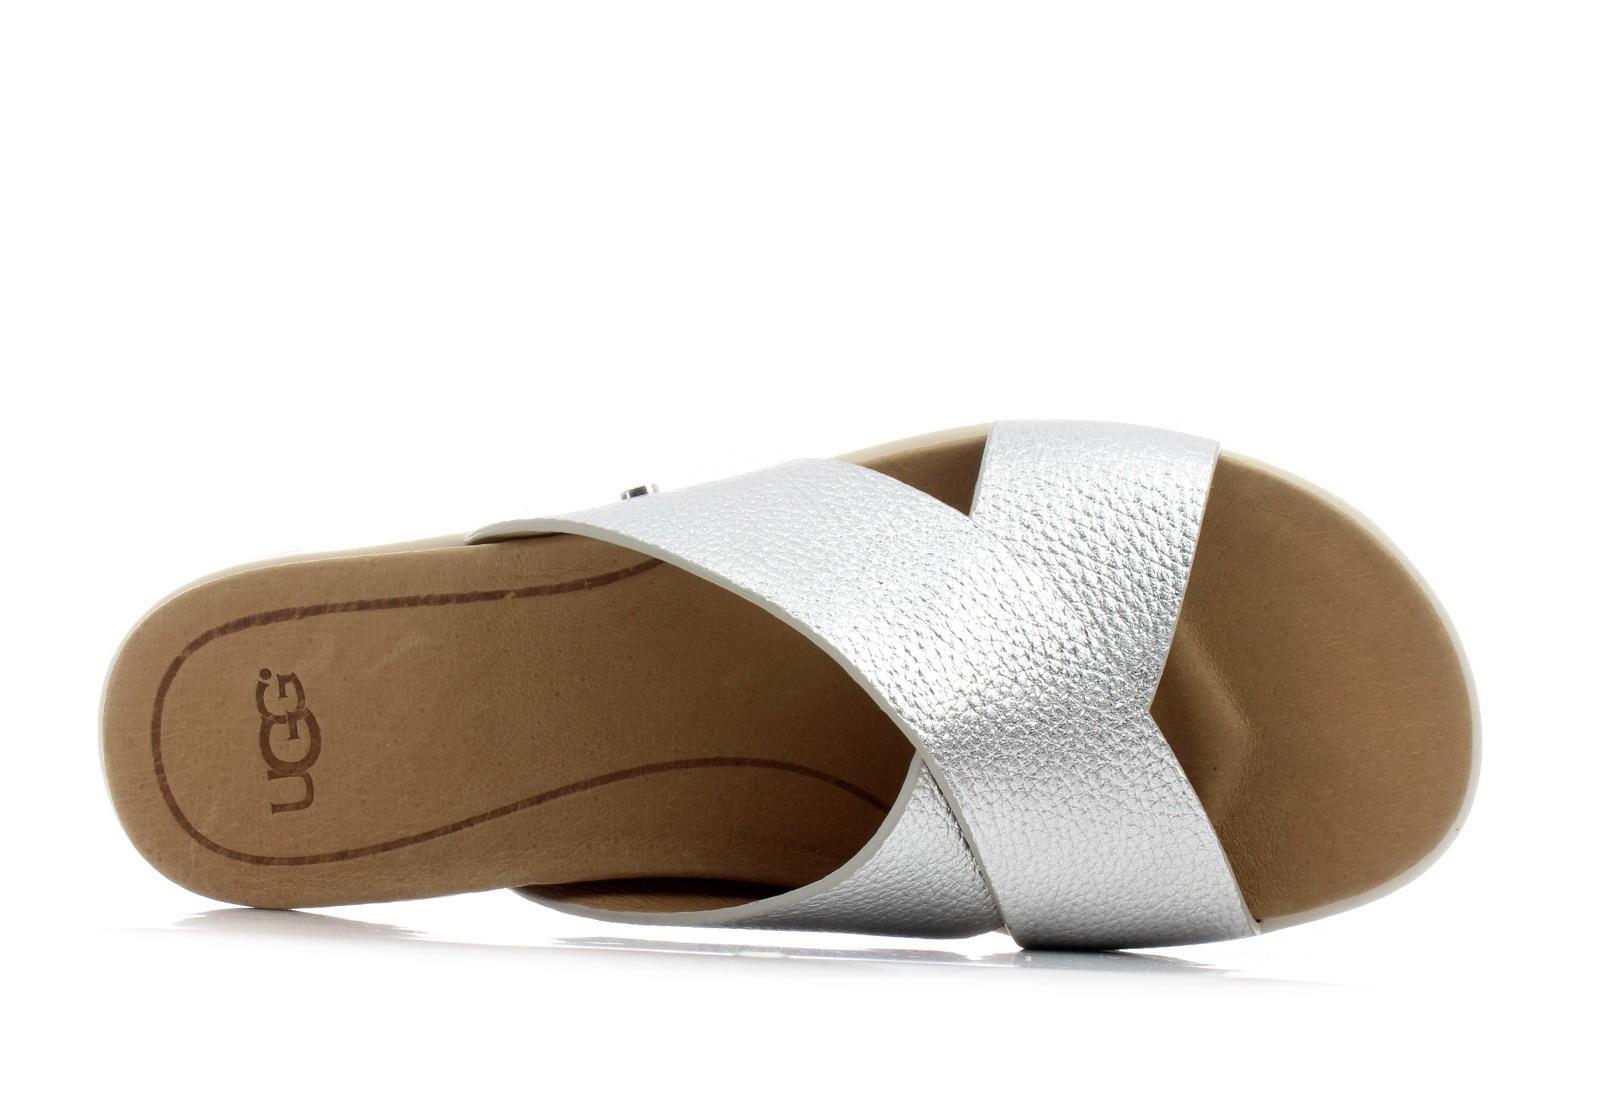 Ugg Slippers Kari Metallic 1102911 Slvr Online Shop